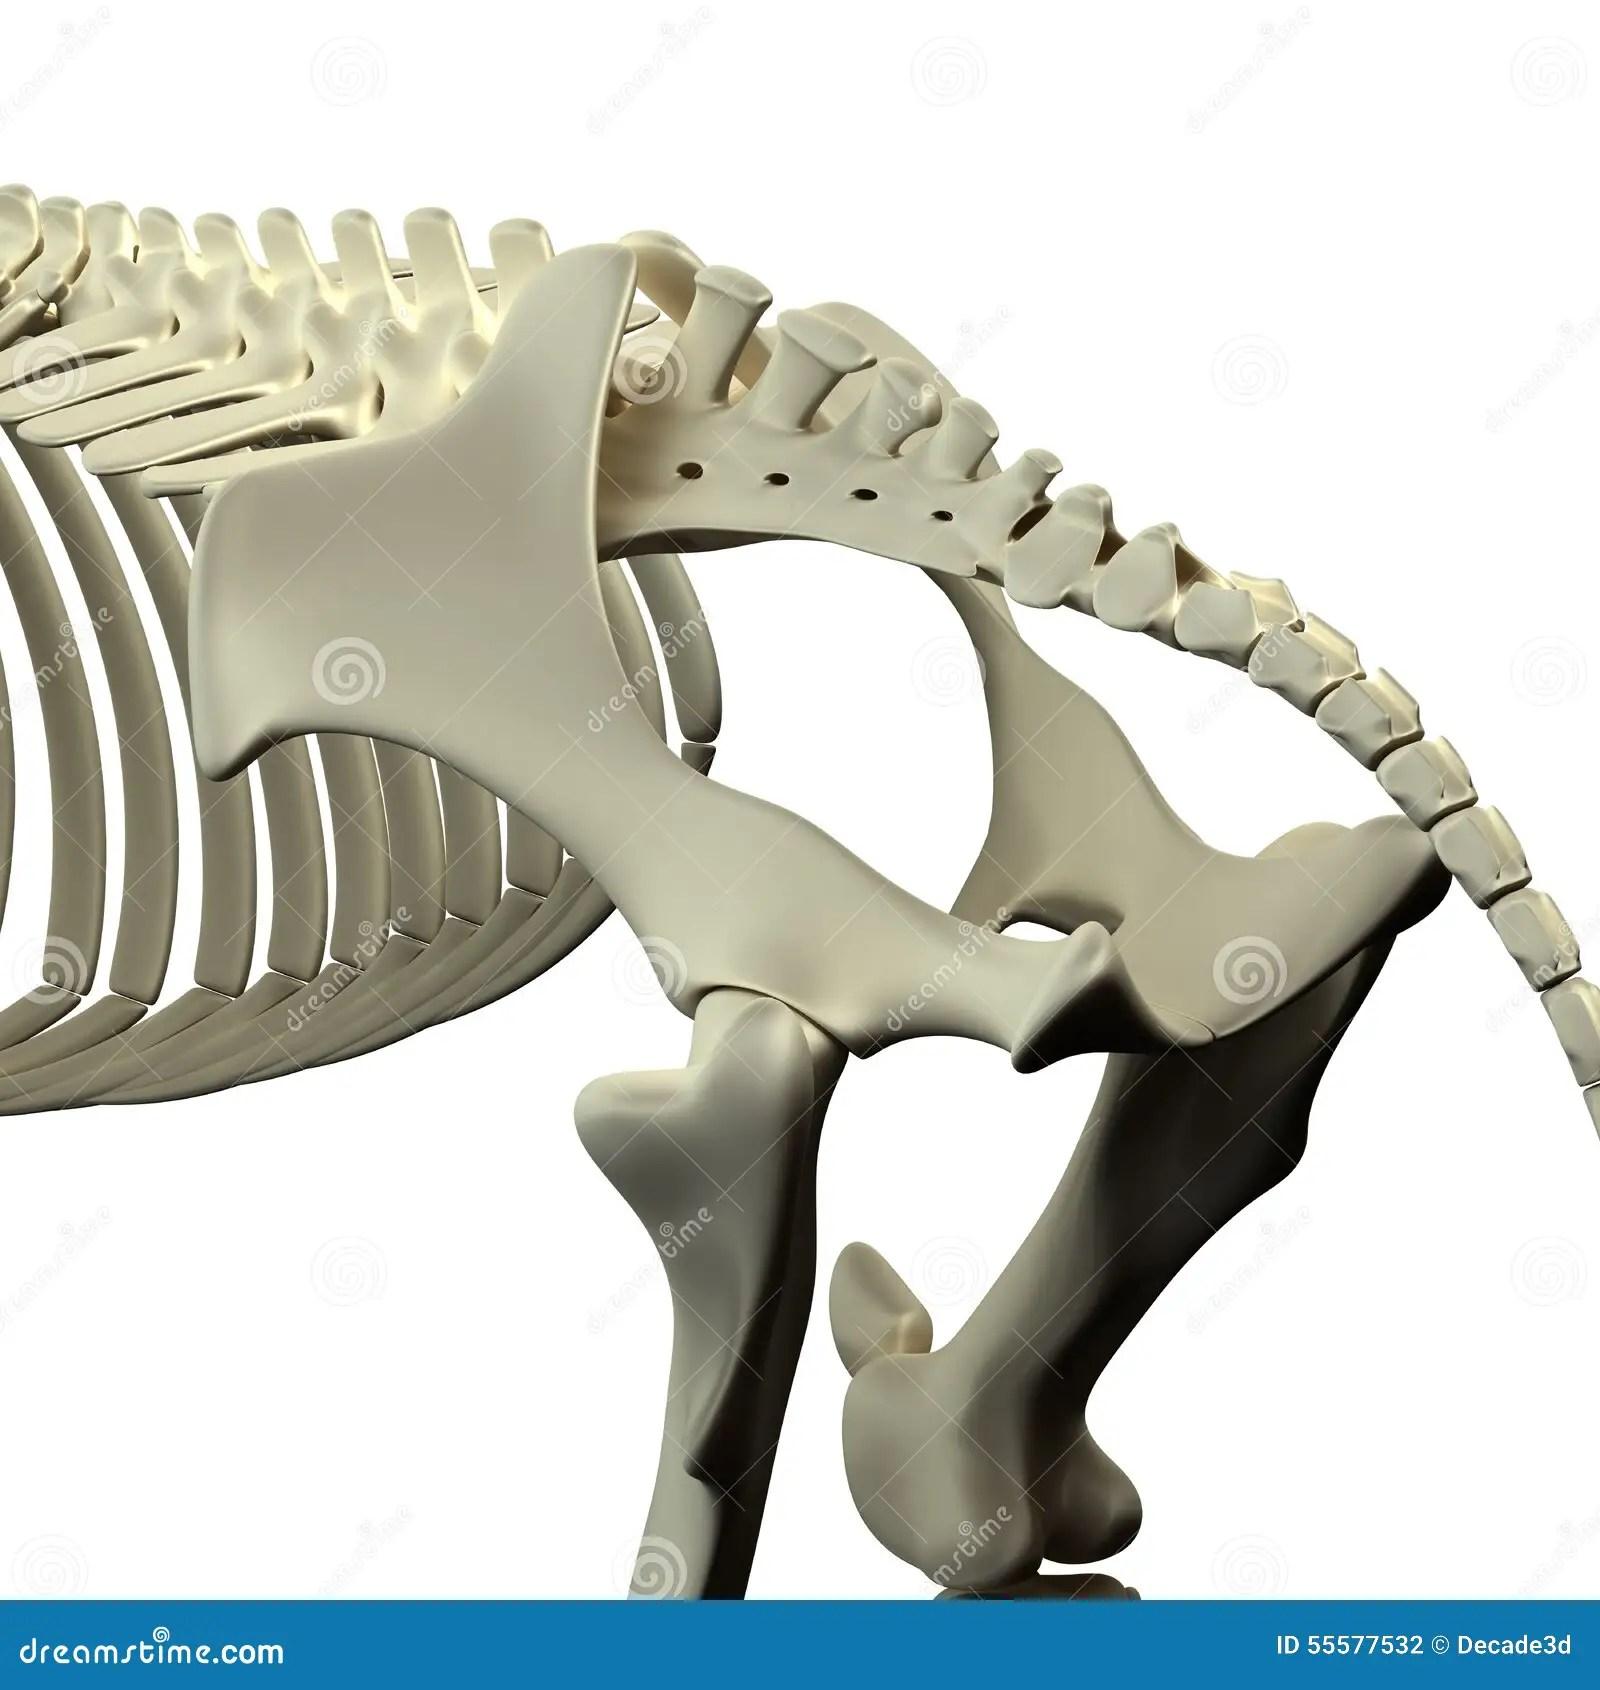 Magnificent Dog Pelvis Anatomy Inspiration - Human Anatomy Images ...